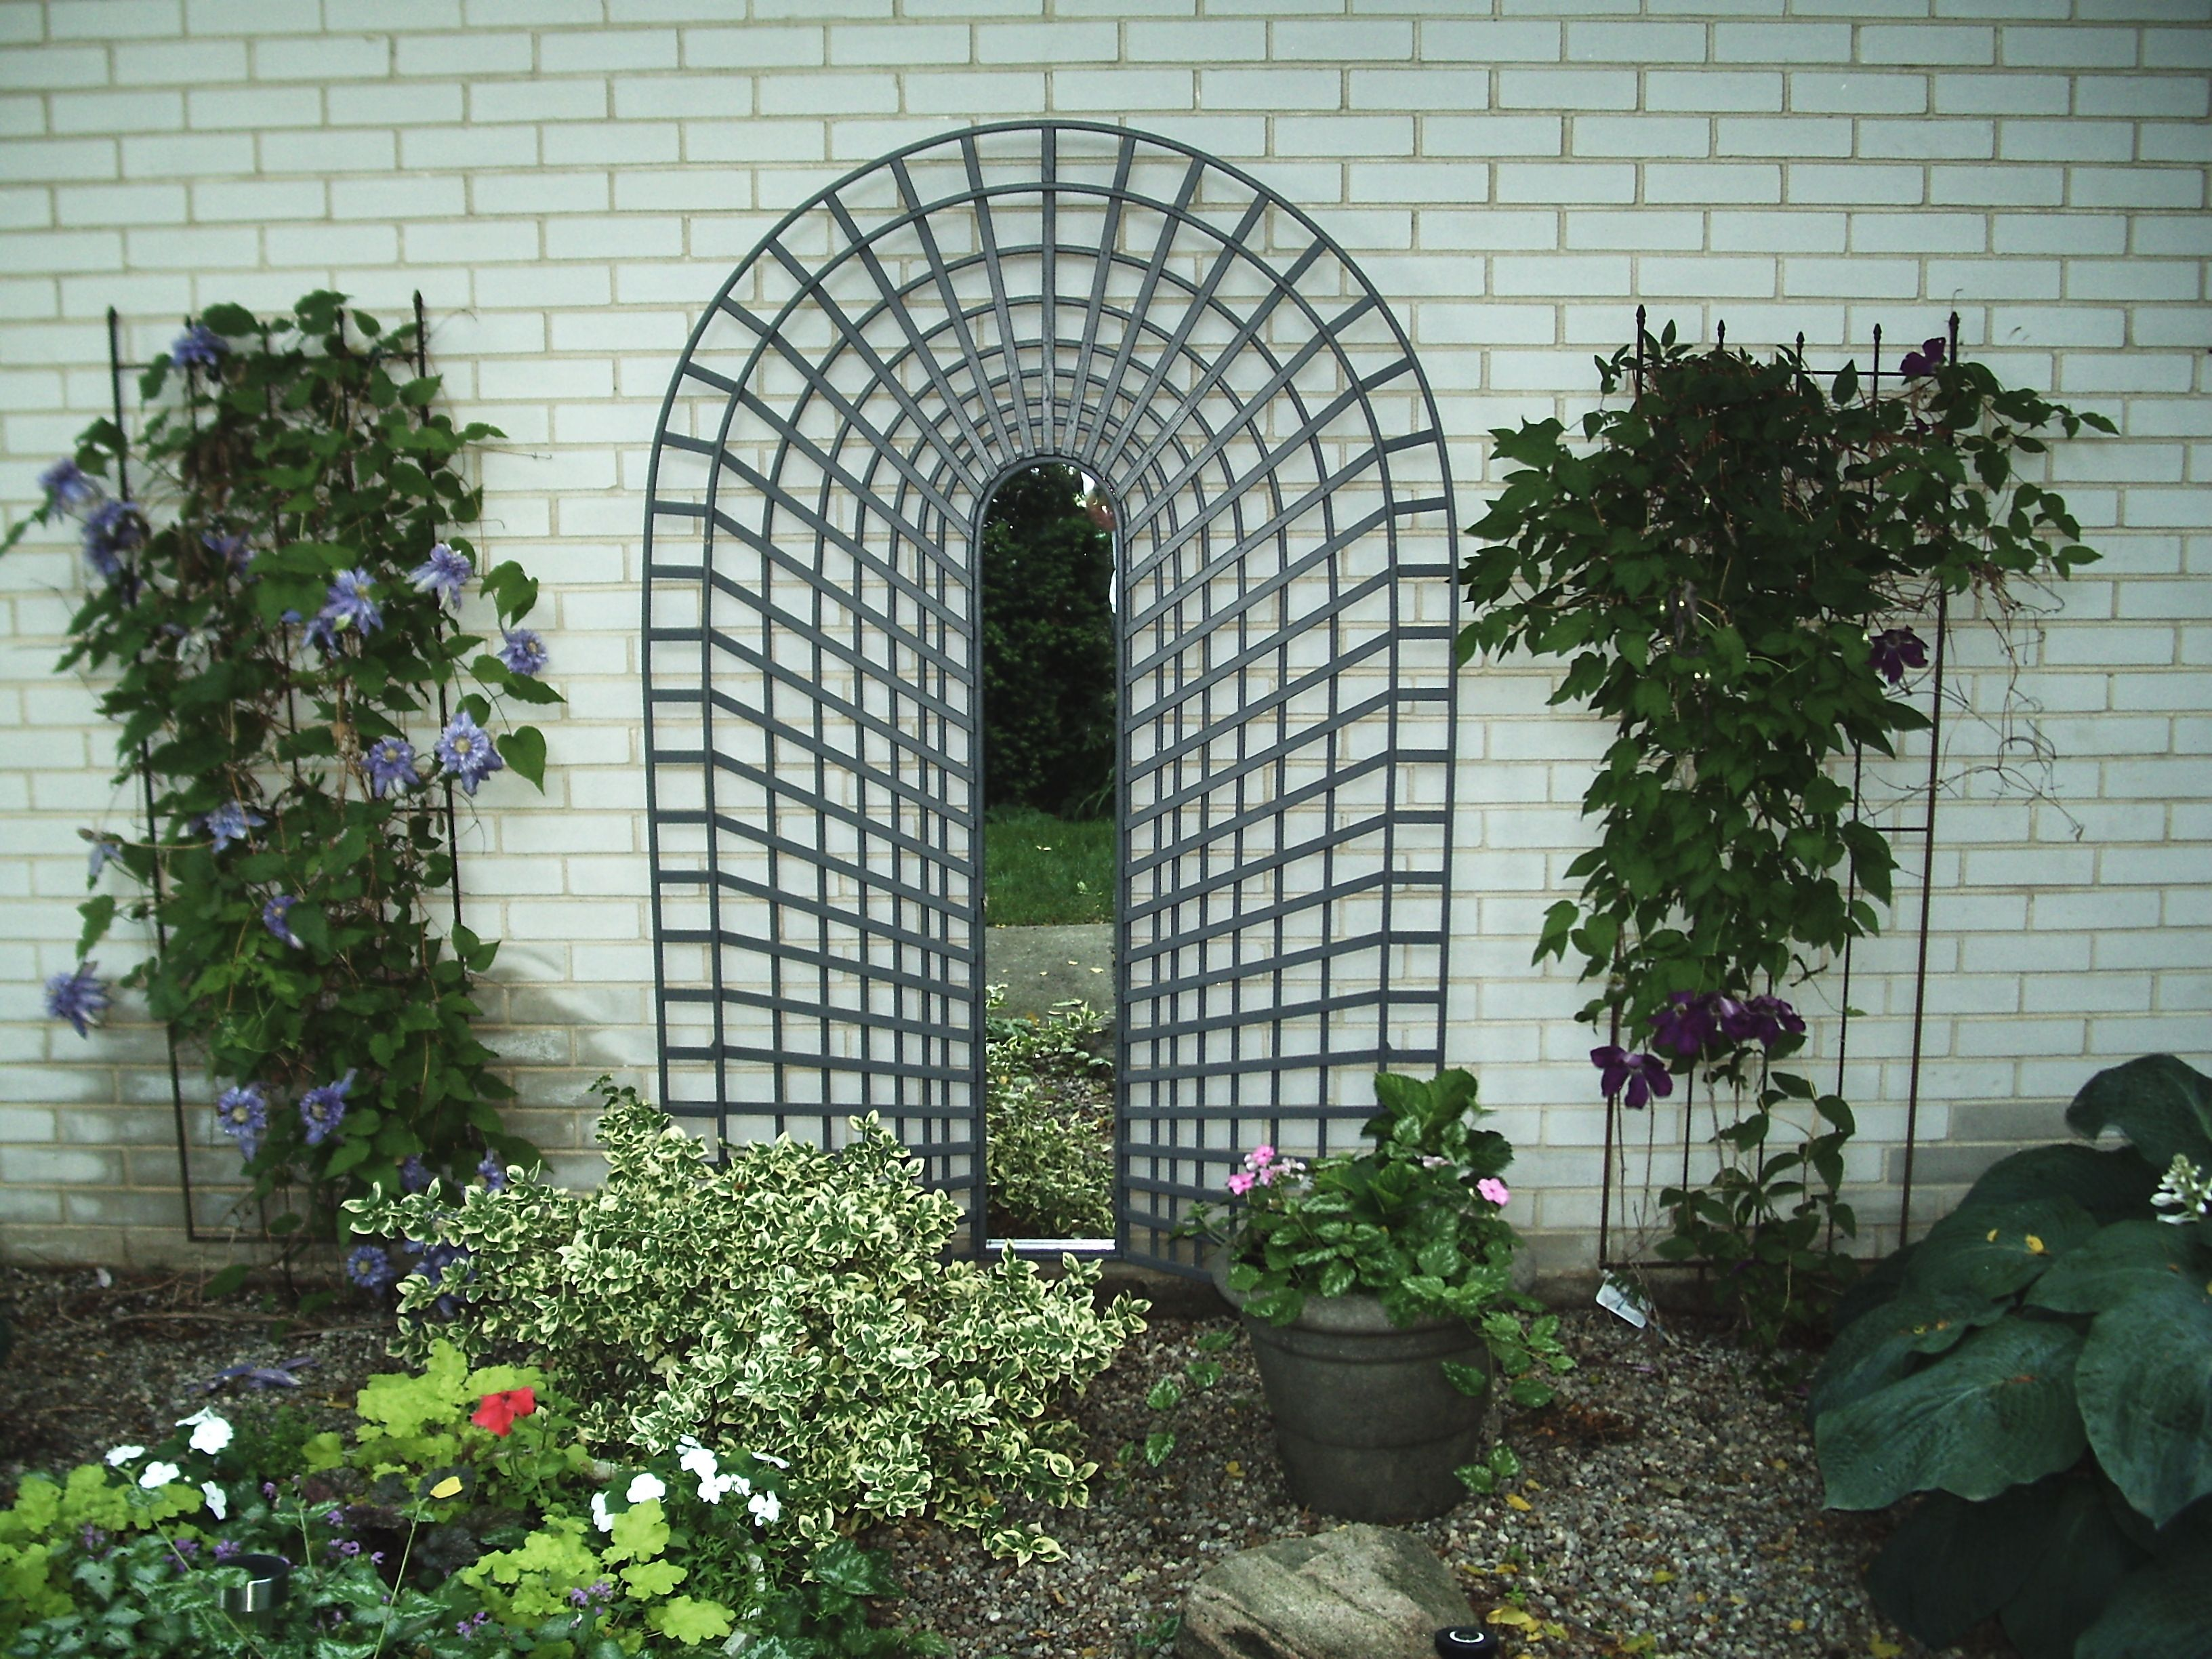 Garden Trellis Trompe L Oeil To Fool The Eye Hand